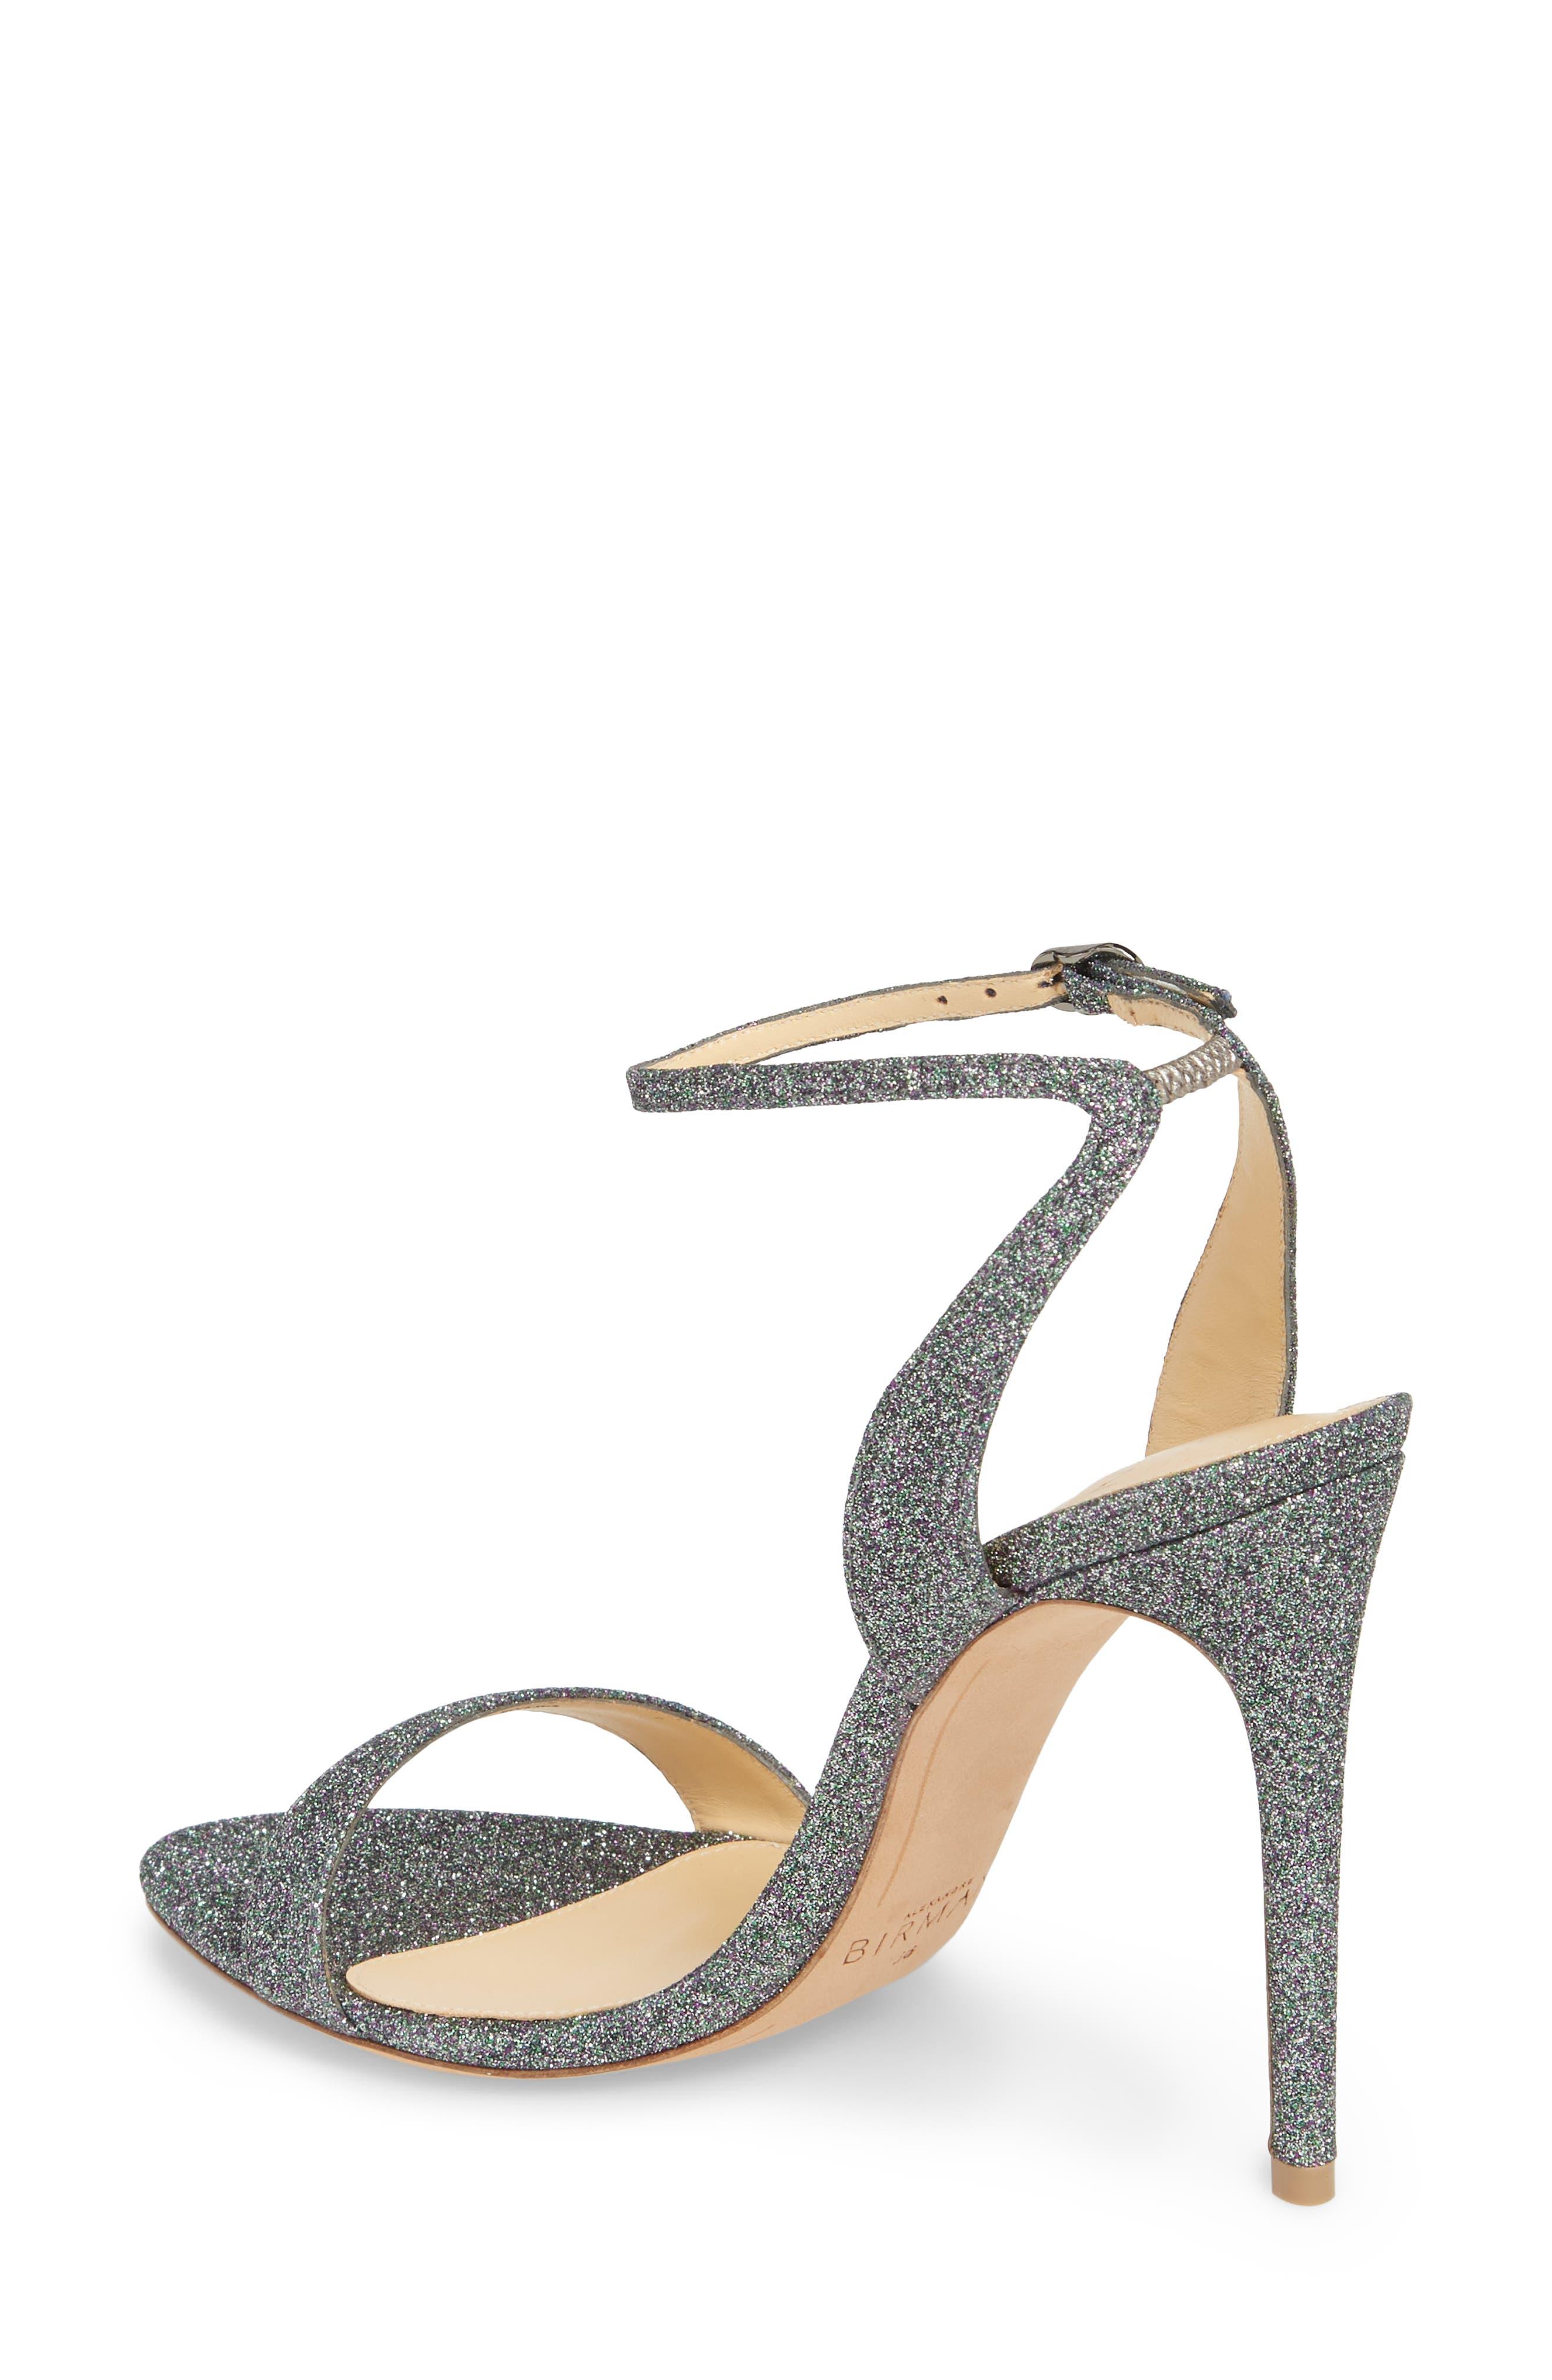 Santine Ankle Strap Sandal,                             Alternate thumbnail 2, color,                             040